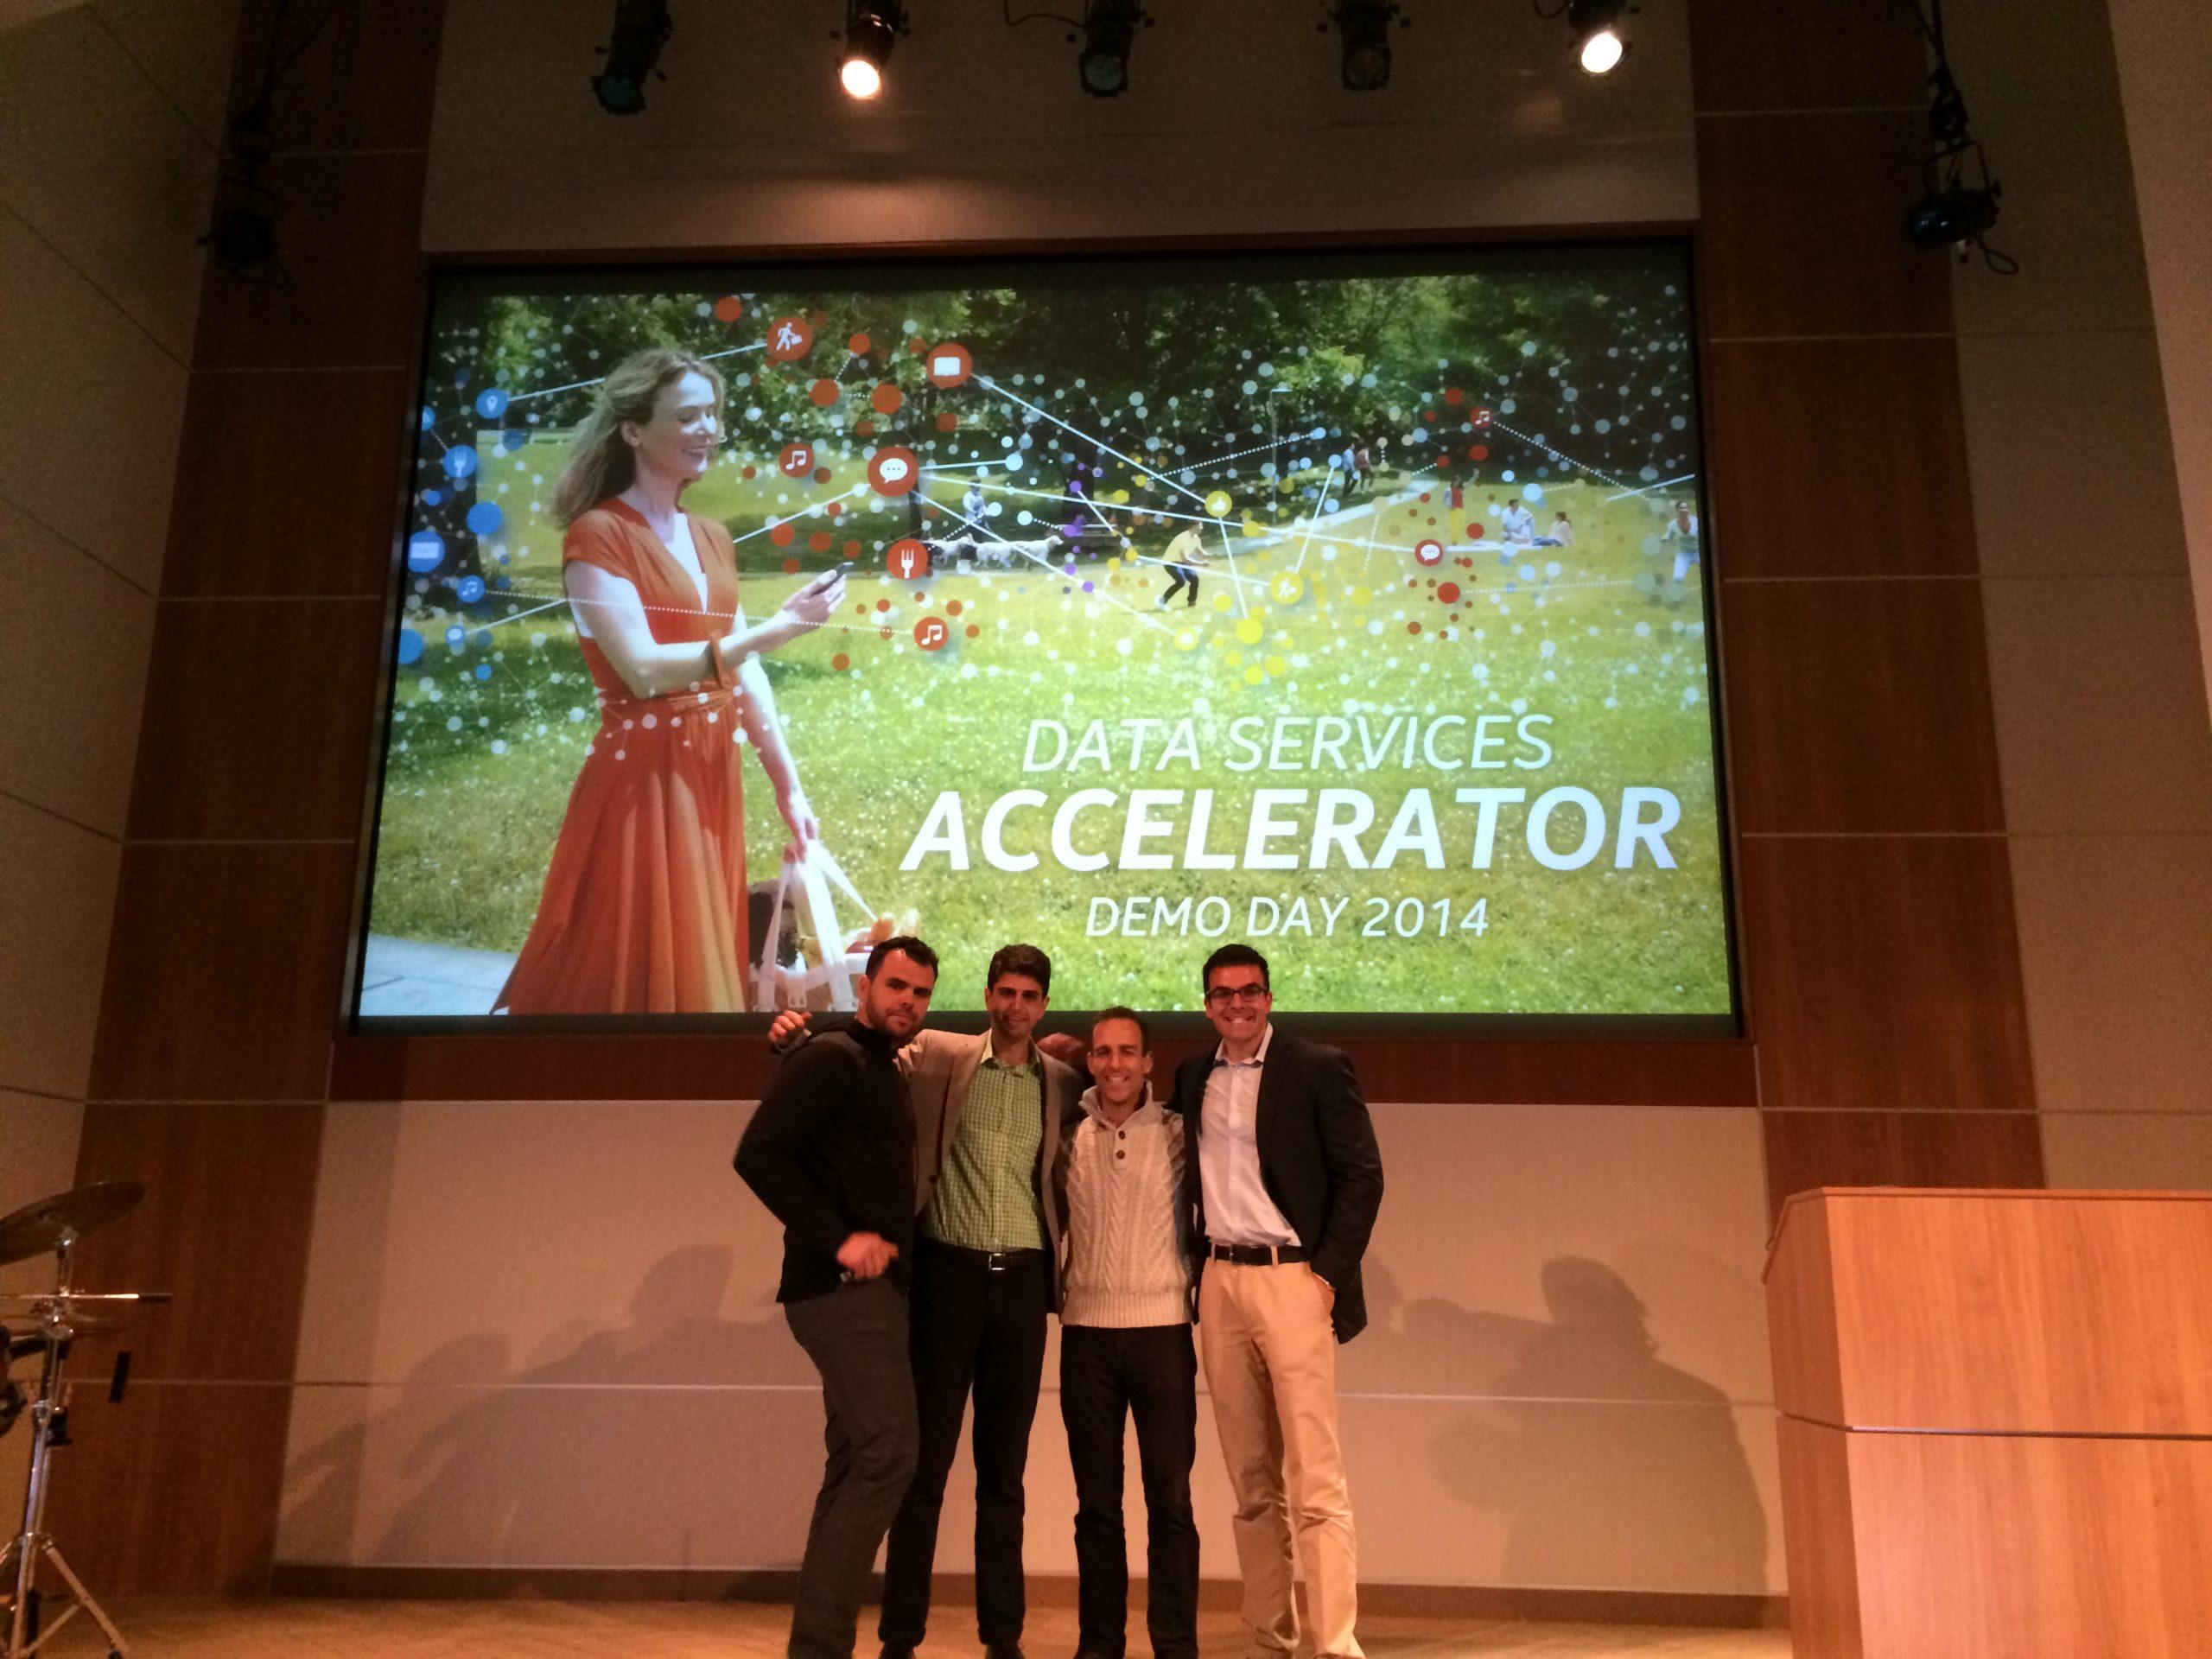 Intel Innovation Pipeline (Data Services Accelerator)